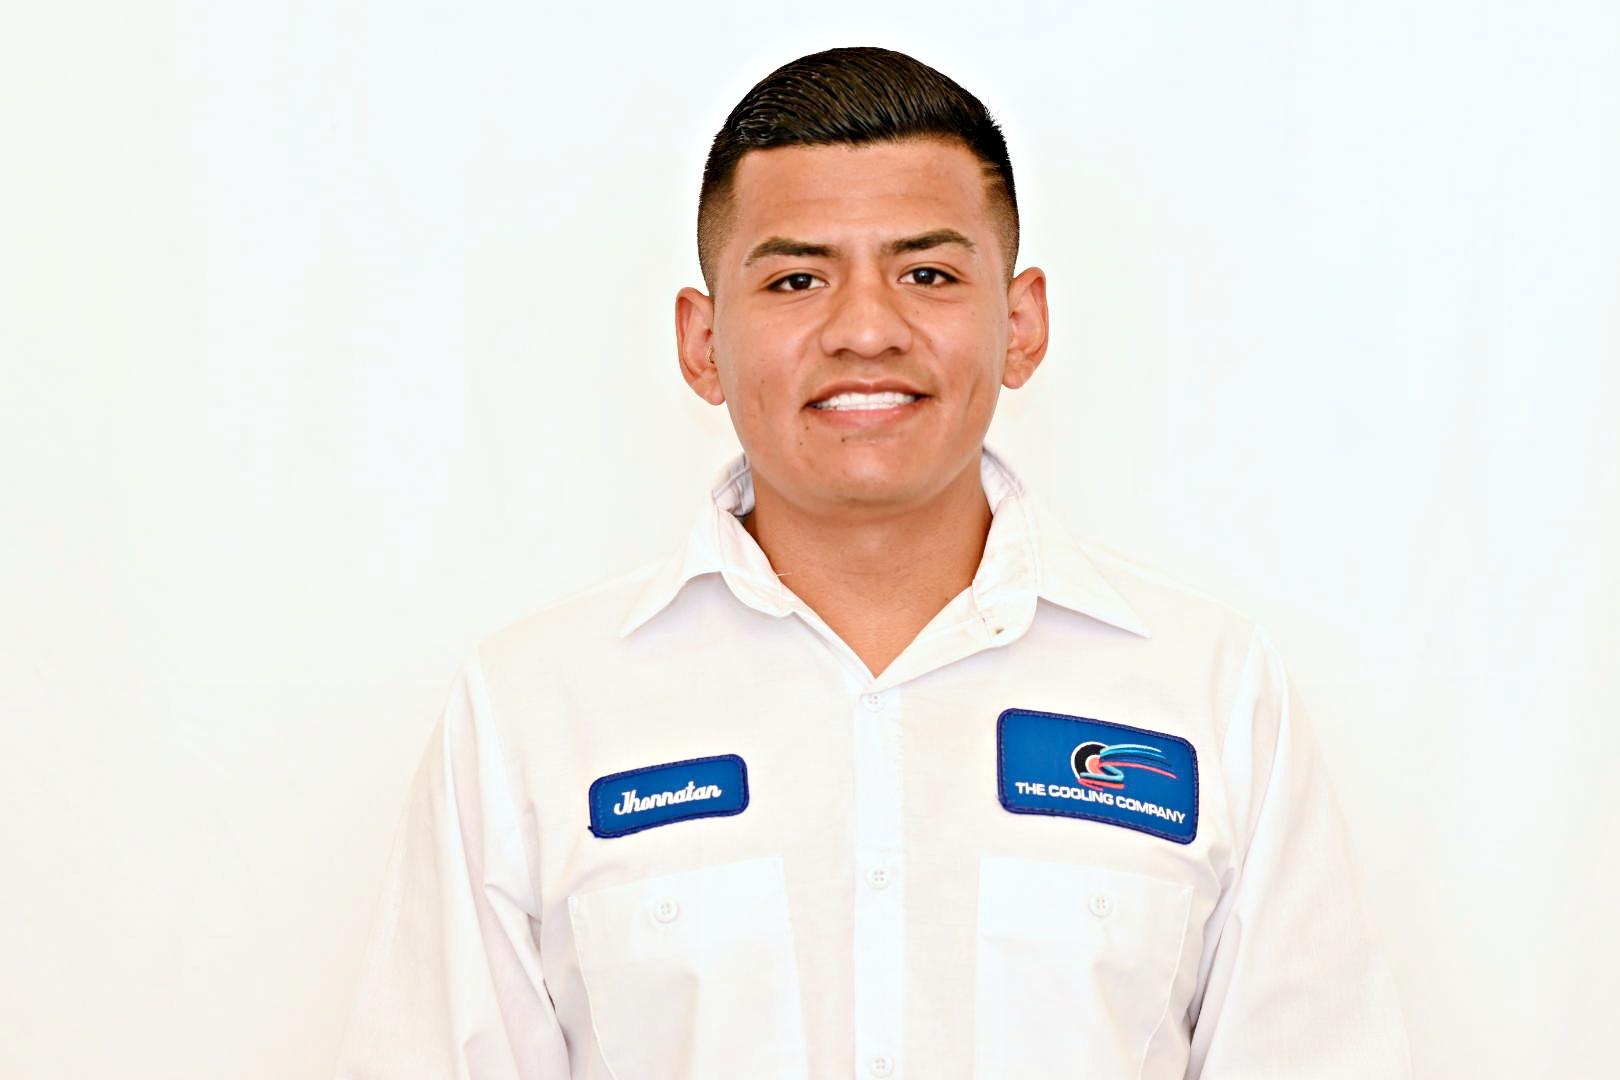 technician Jhonnatan of Cooling Company